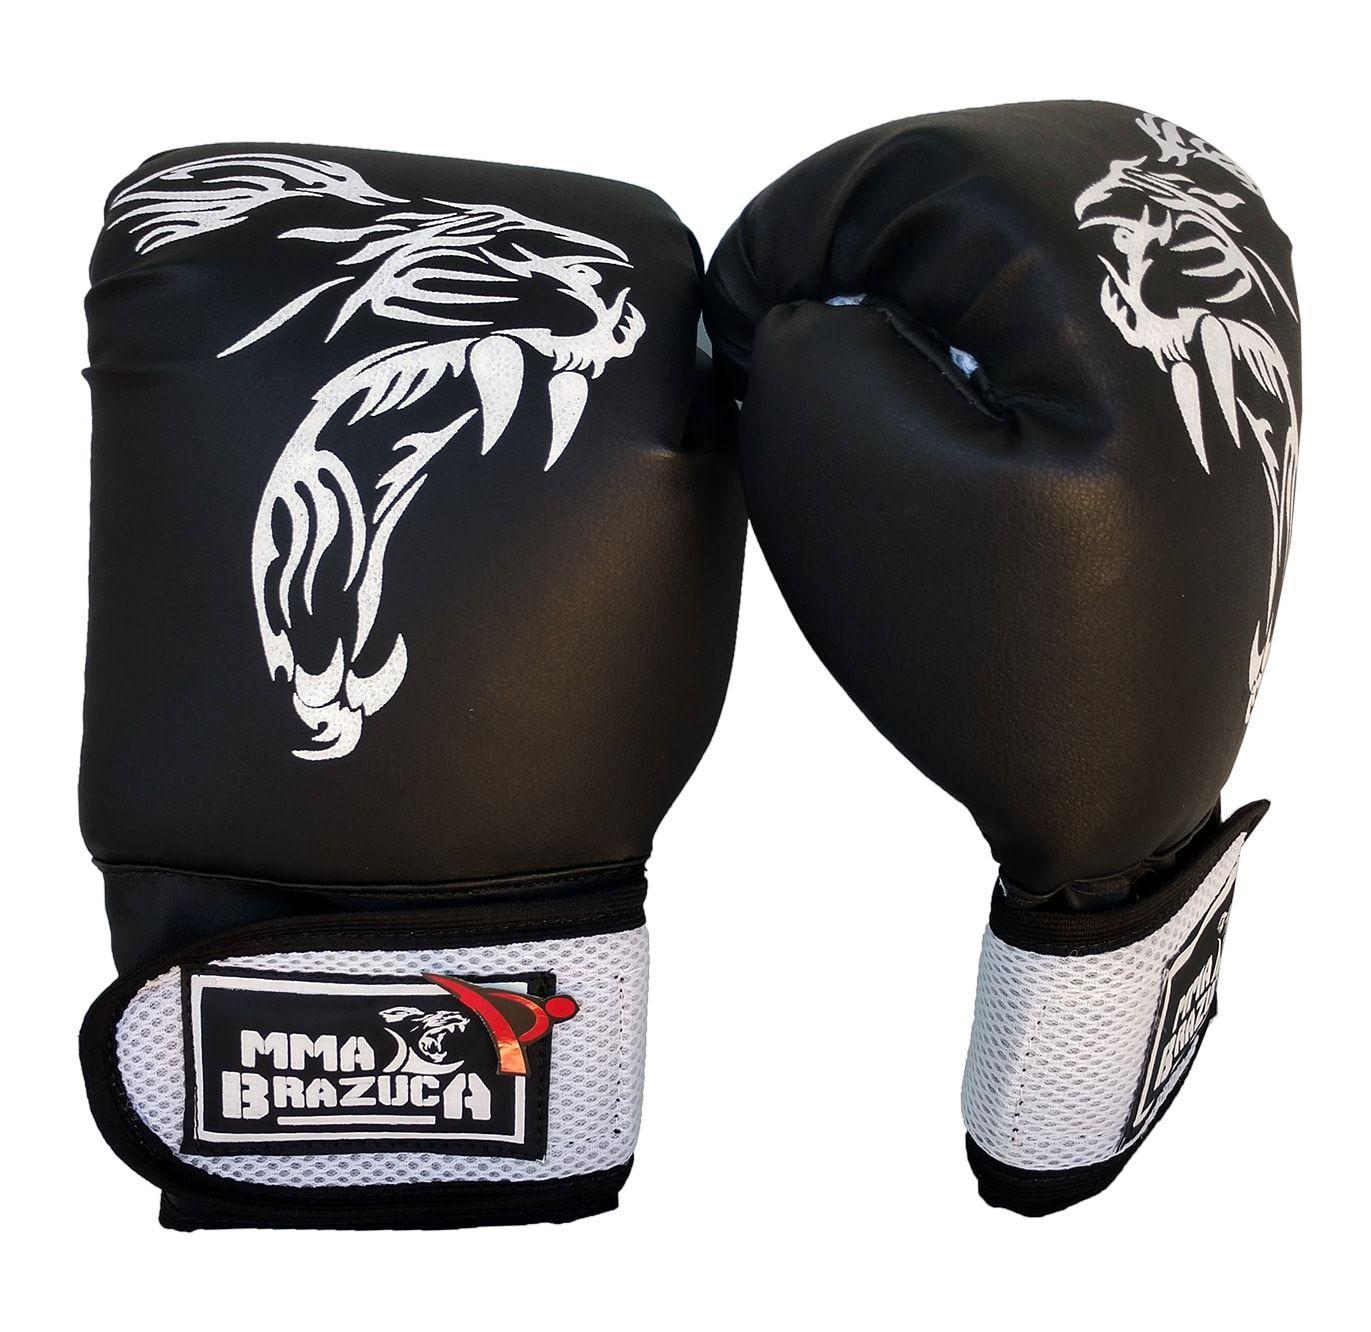 Luva de Boxe / Muay Thai 12oz - Preto com Branco - MMA Brazuka  - PRALUTA SHOP